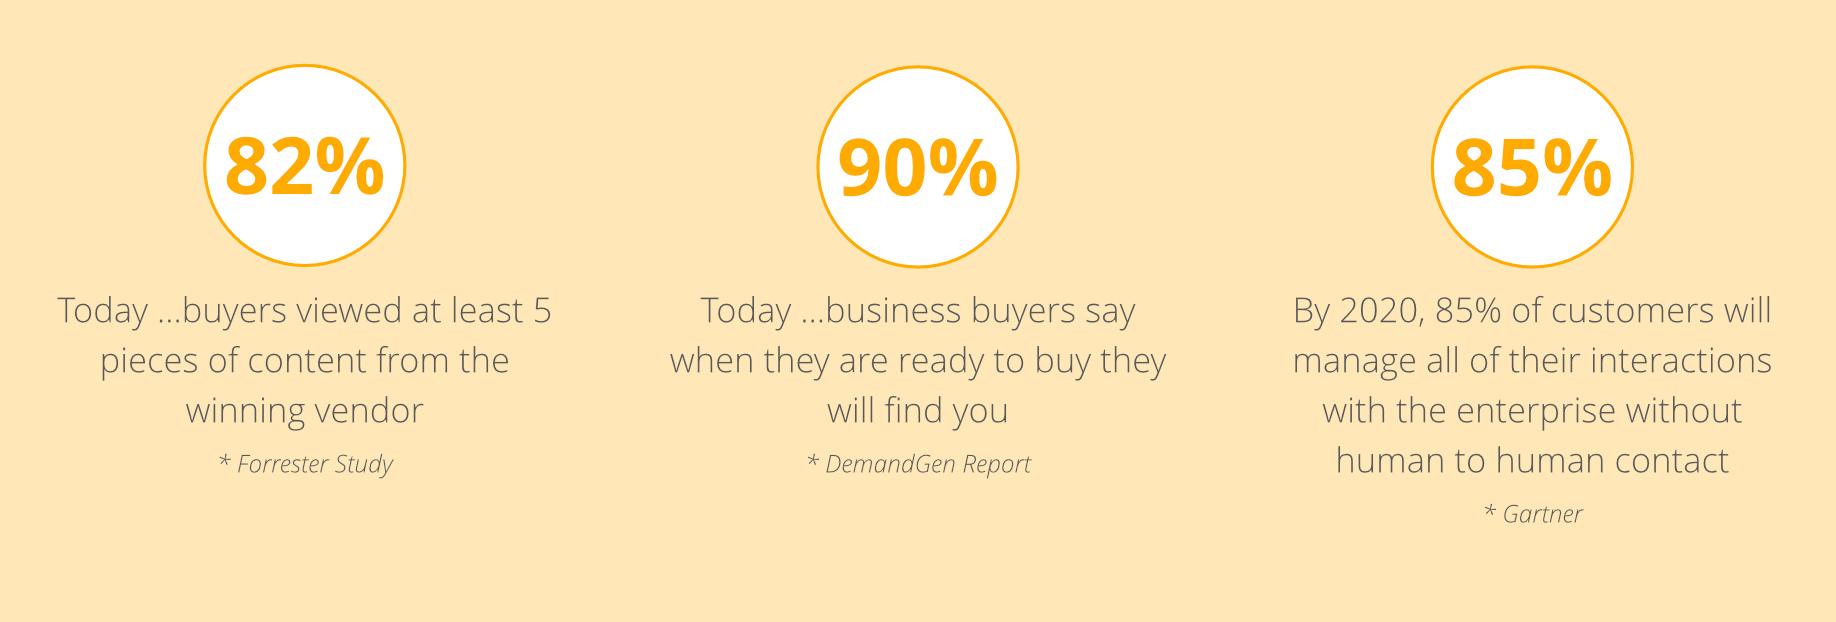 B2B sales and marketing changing-digirati